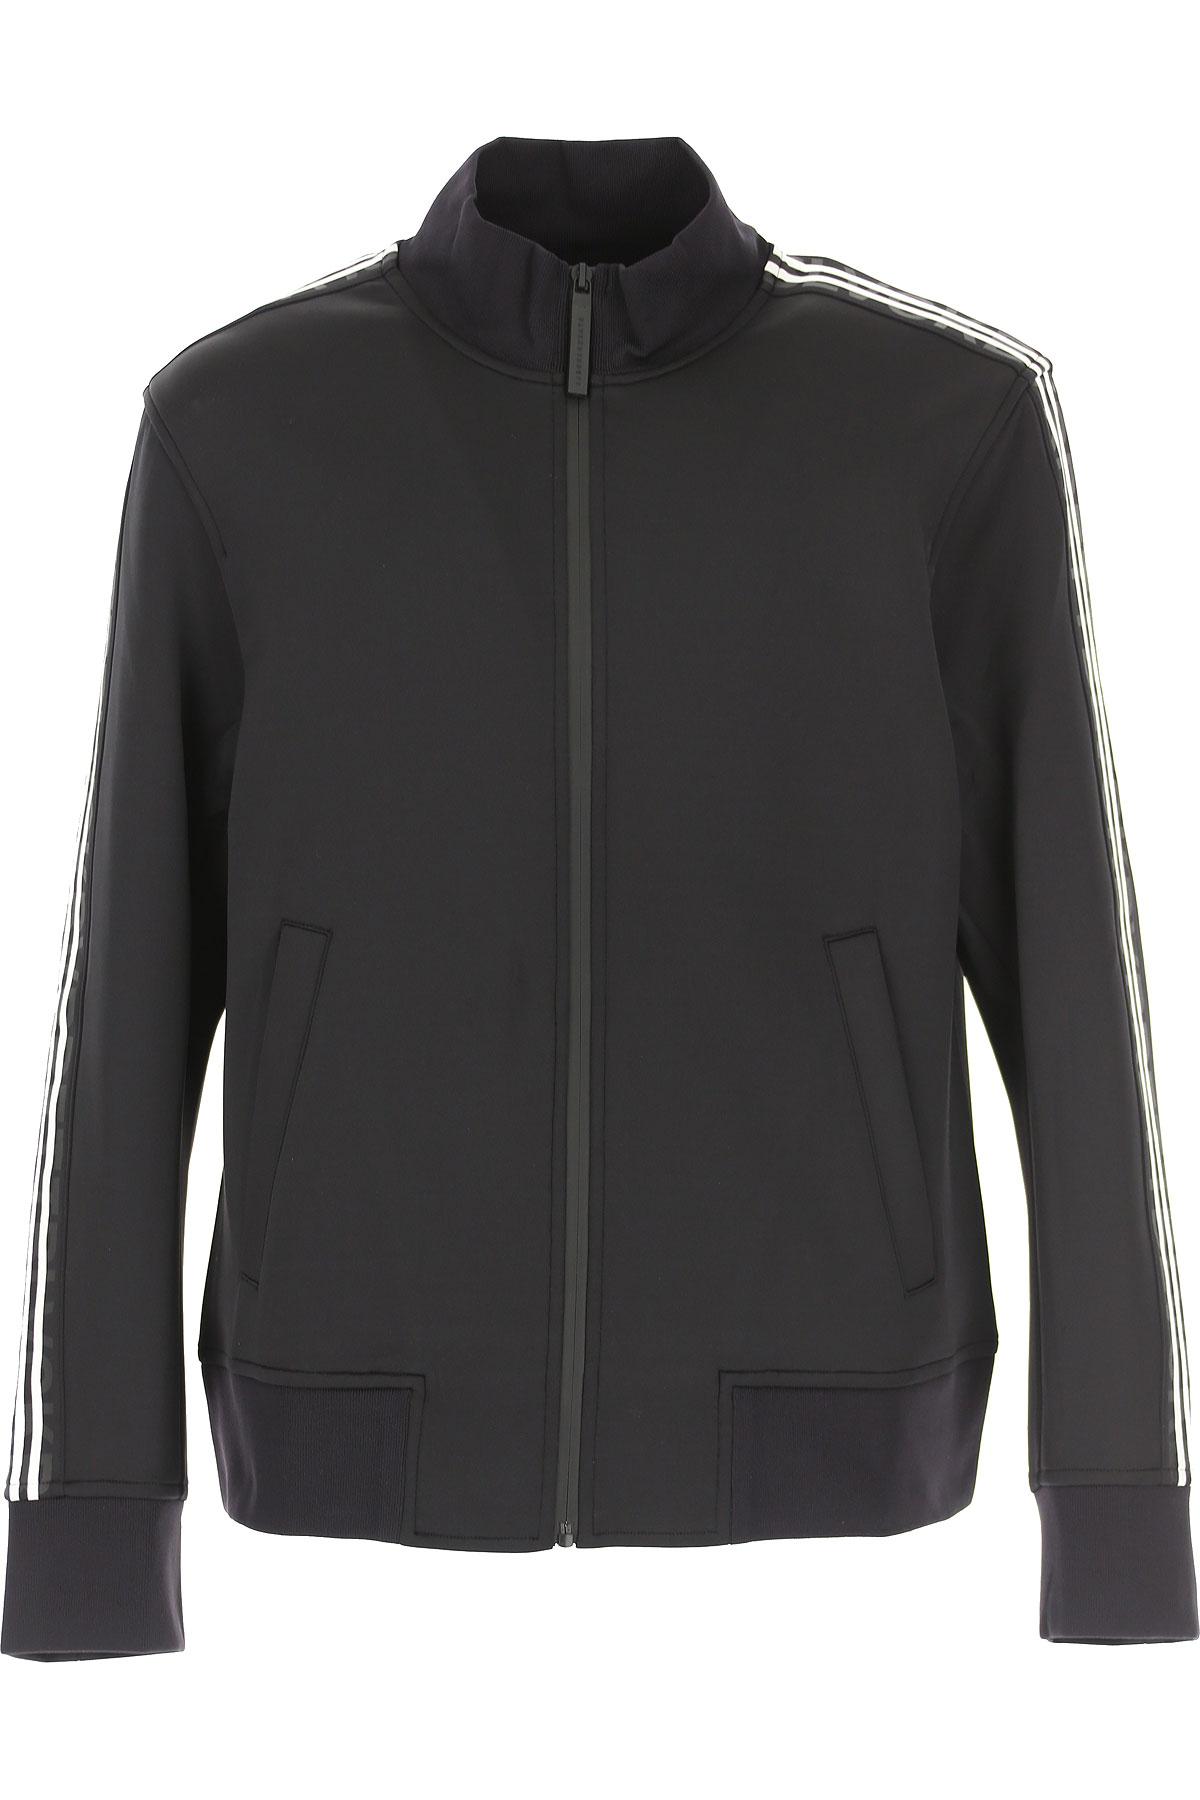 BlackBarrett Sweatshirt for Men On Sale, Black, polyamide, 2019, L M XL